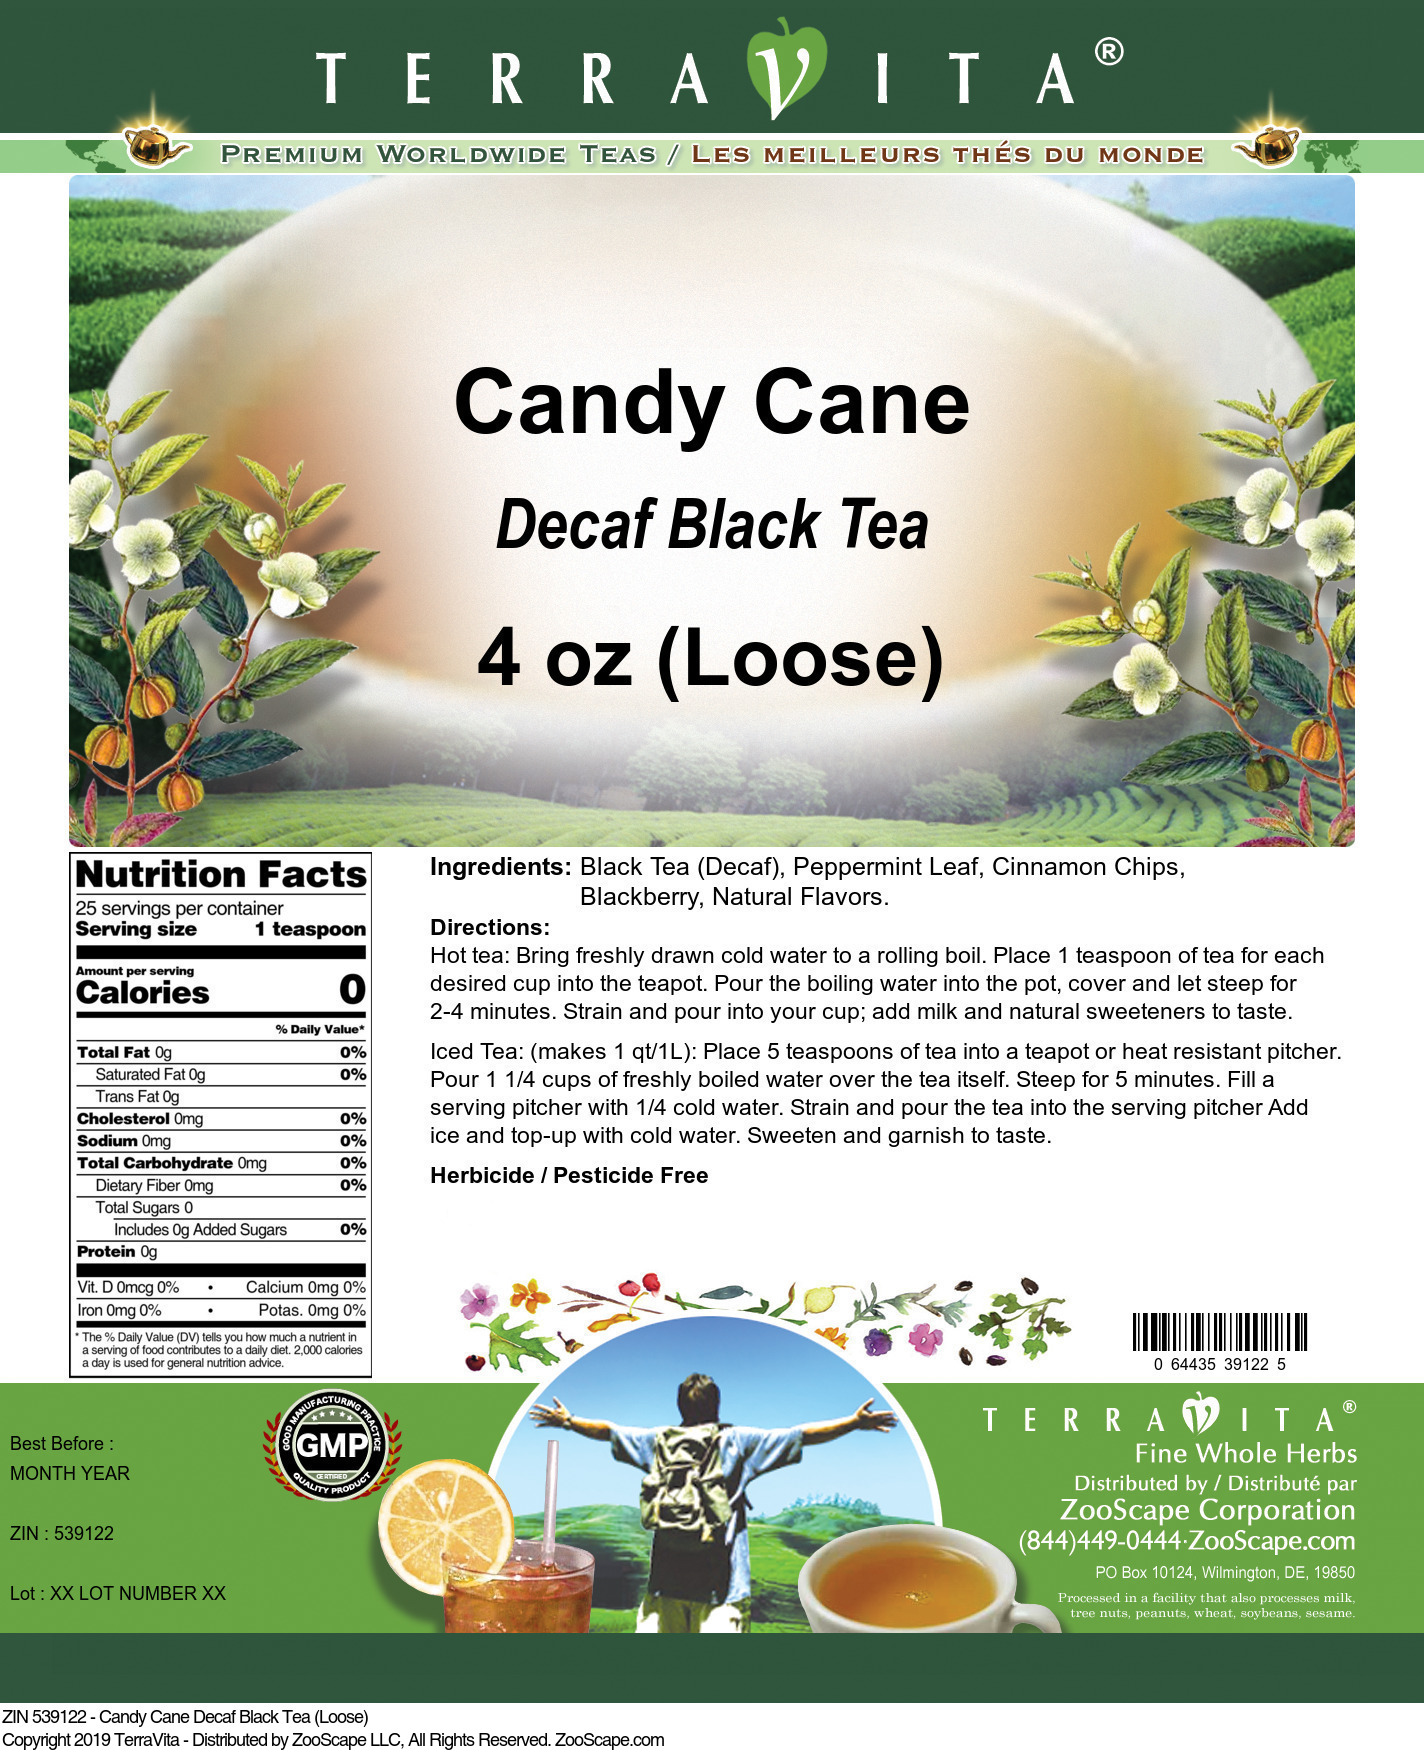 Candy Cane Decaf Black Tea (Loose)